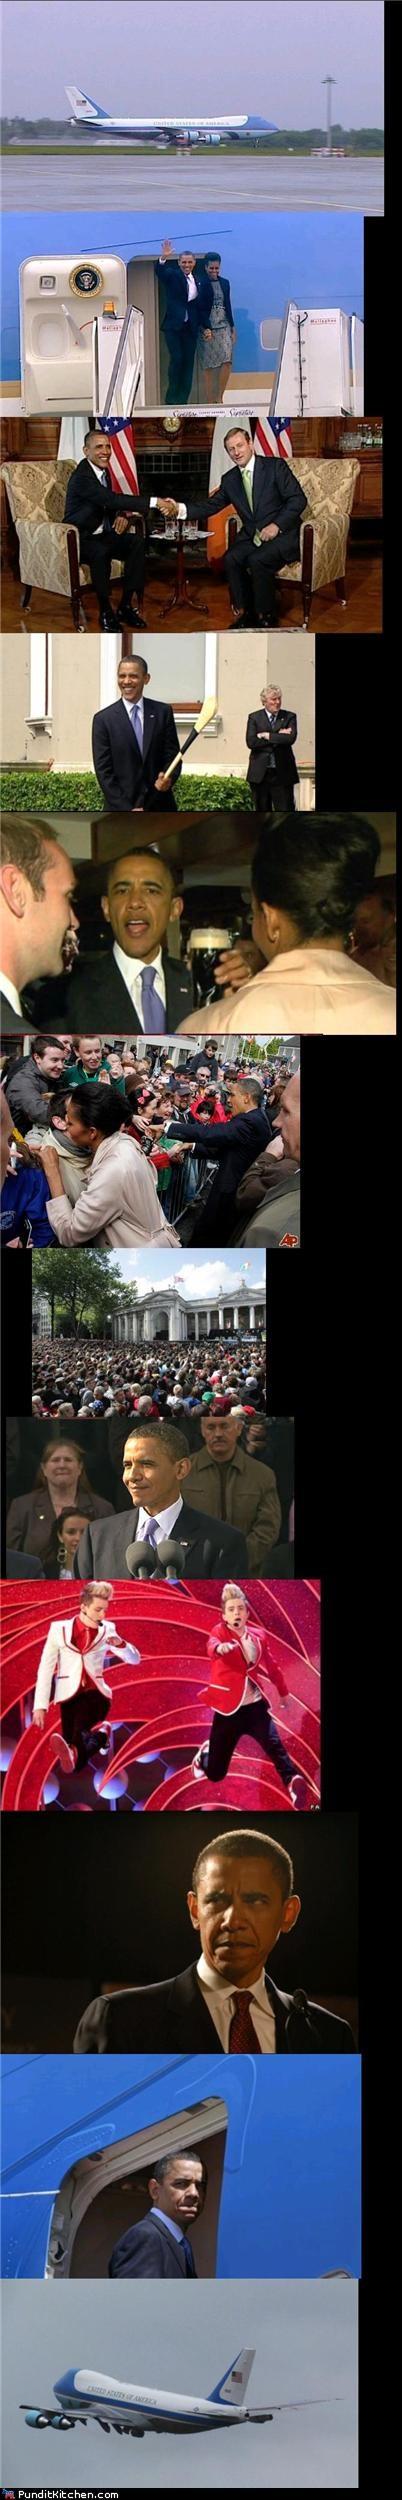 barack obama Ireland political pictures - 4794552064